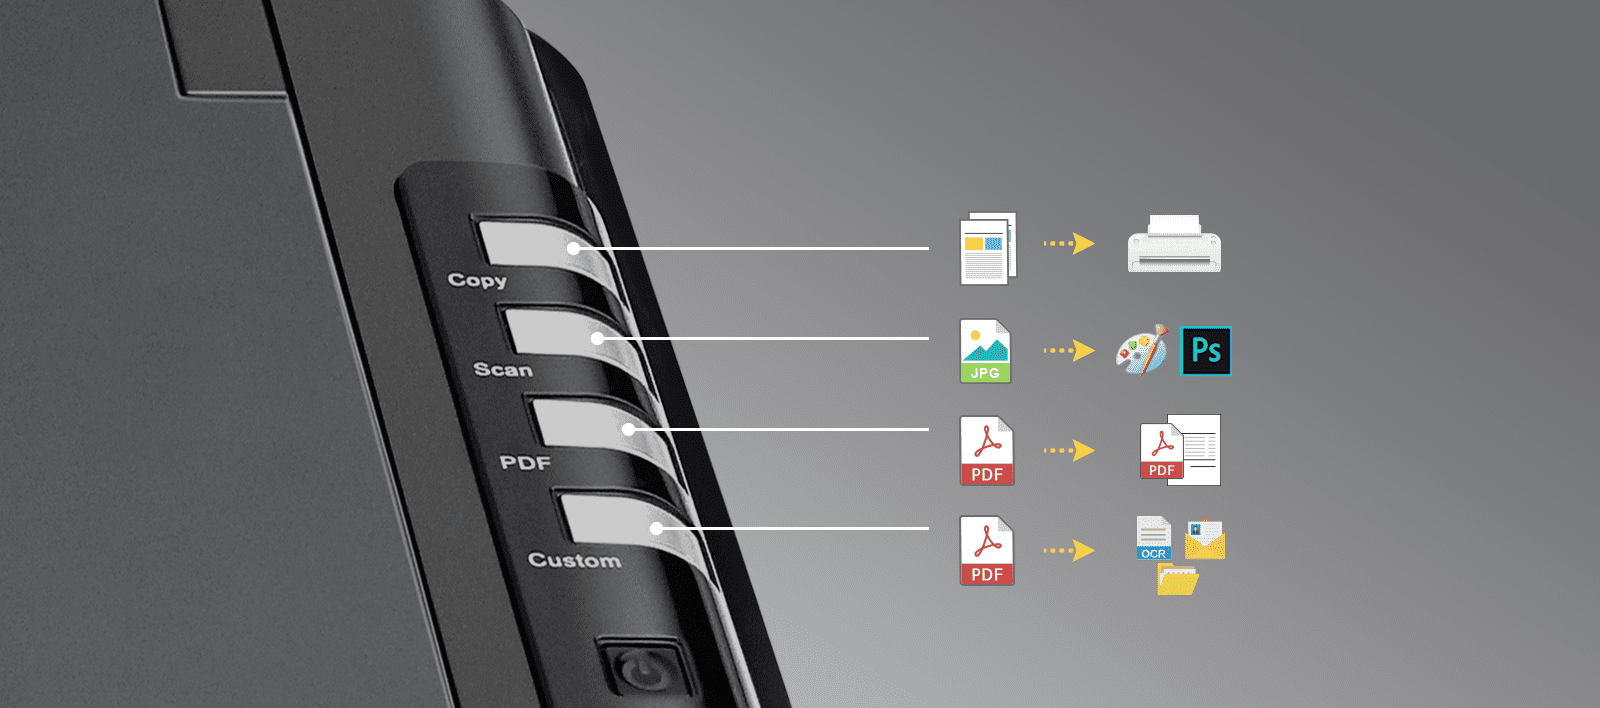 Copy, scan, PDF and custom